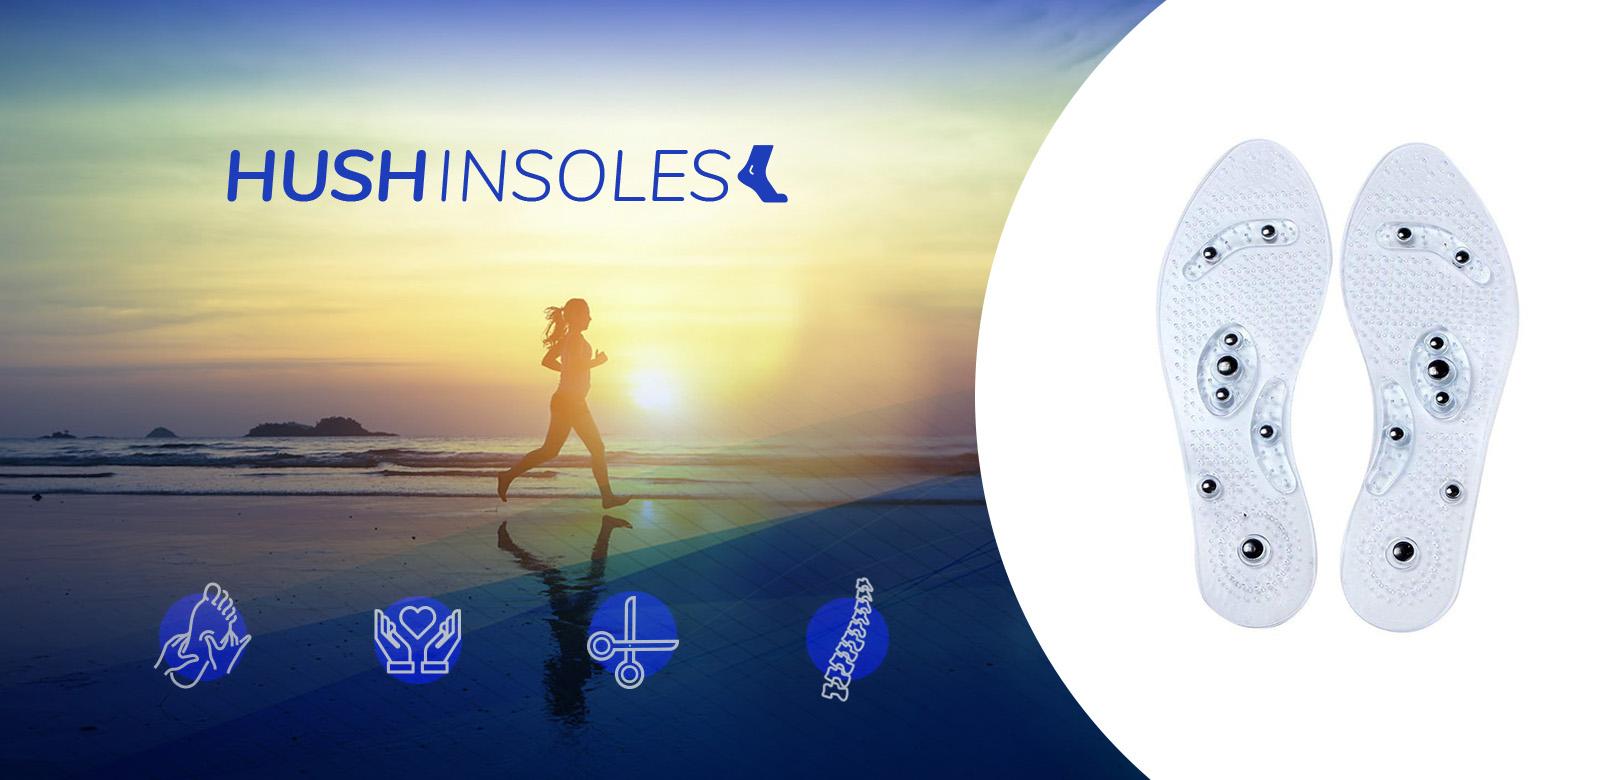 hushinsoles, hushinsoles price, hushinsoles buy, feet health, healthy feet, feet massage, spine health, backbone, reflexology